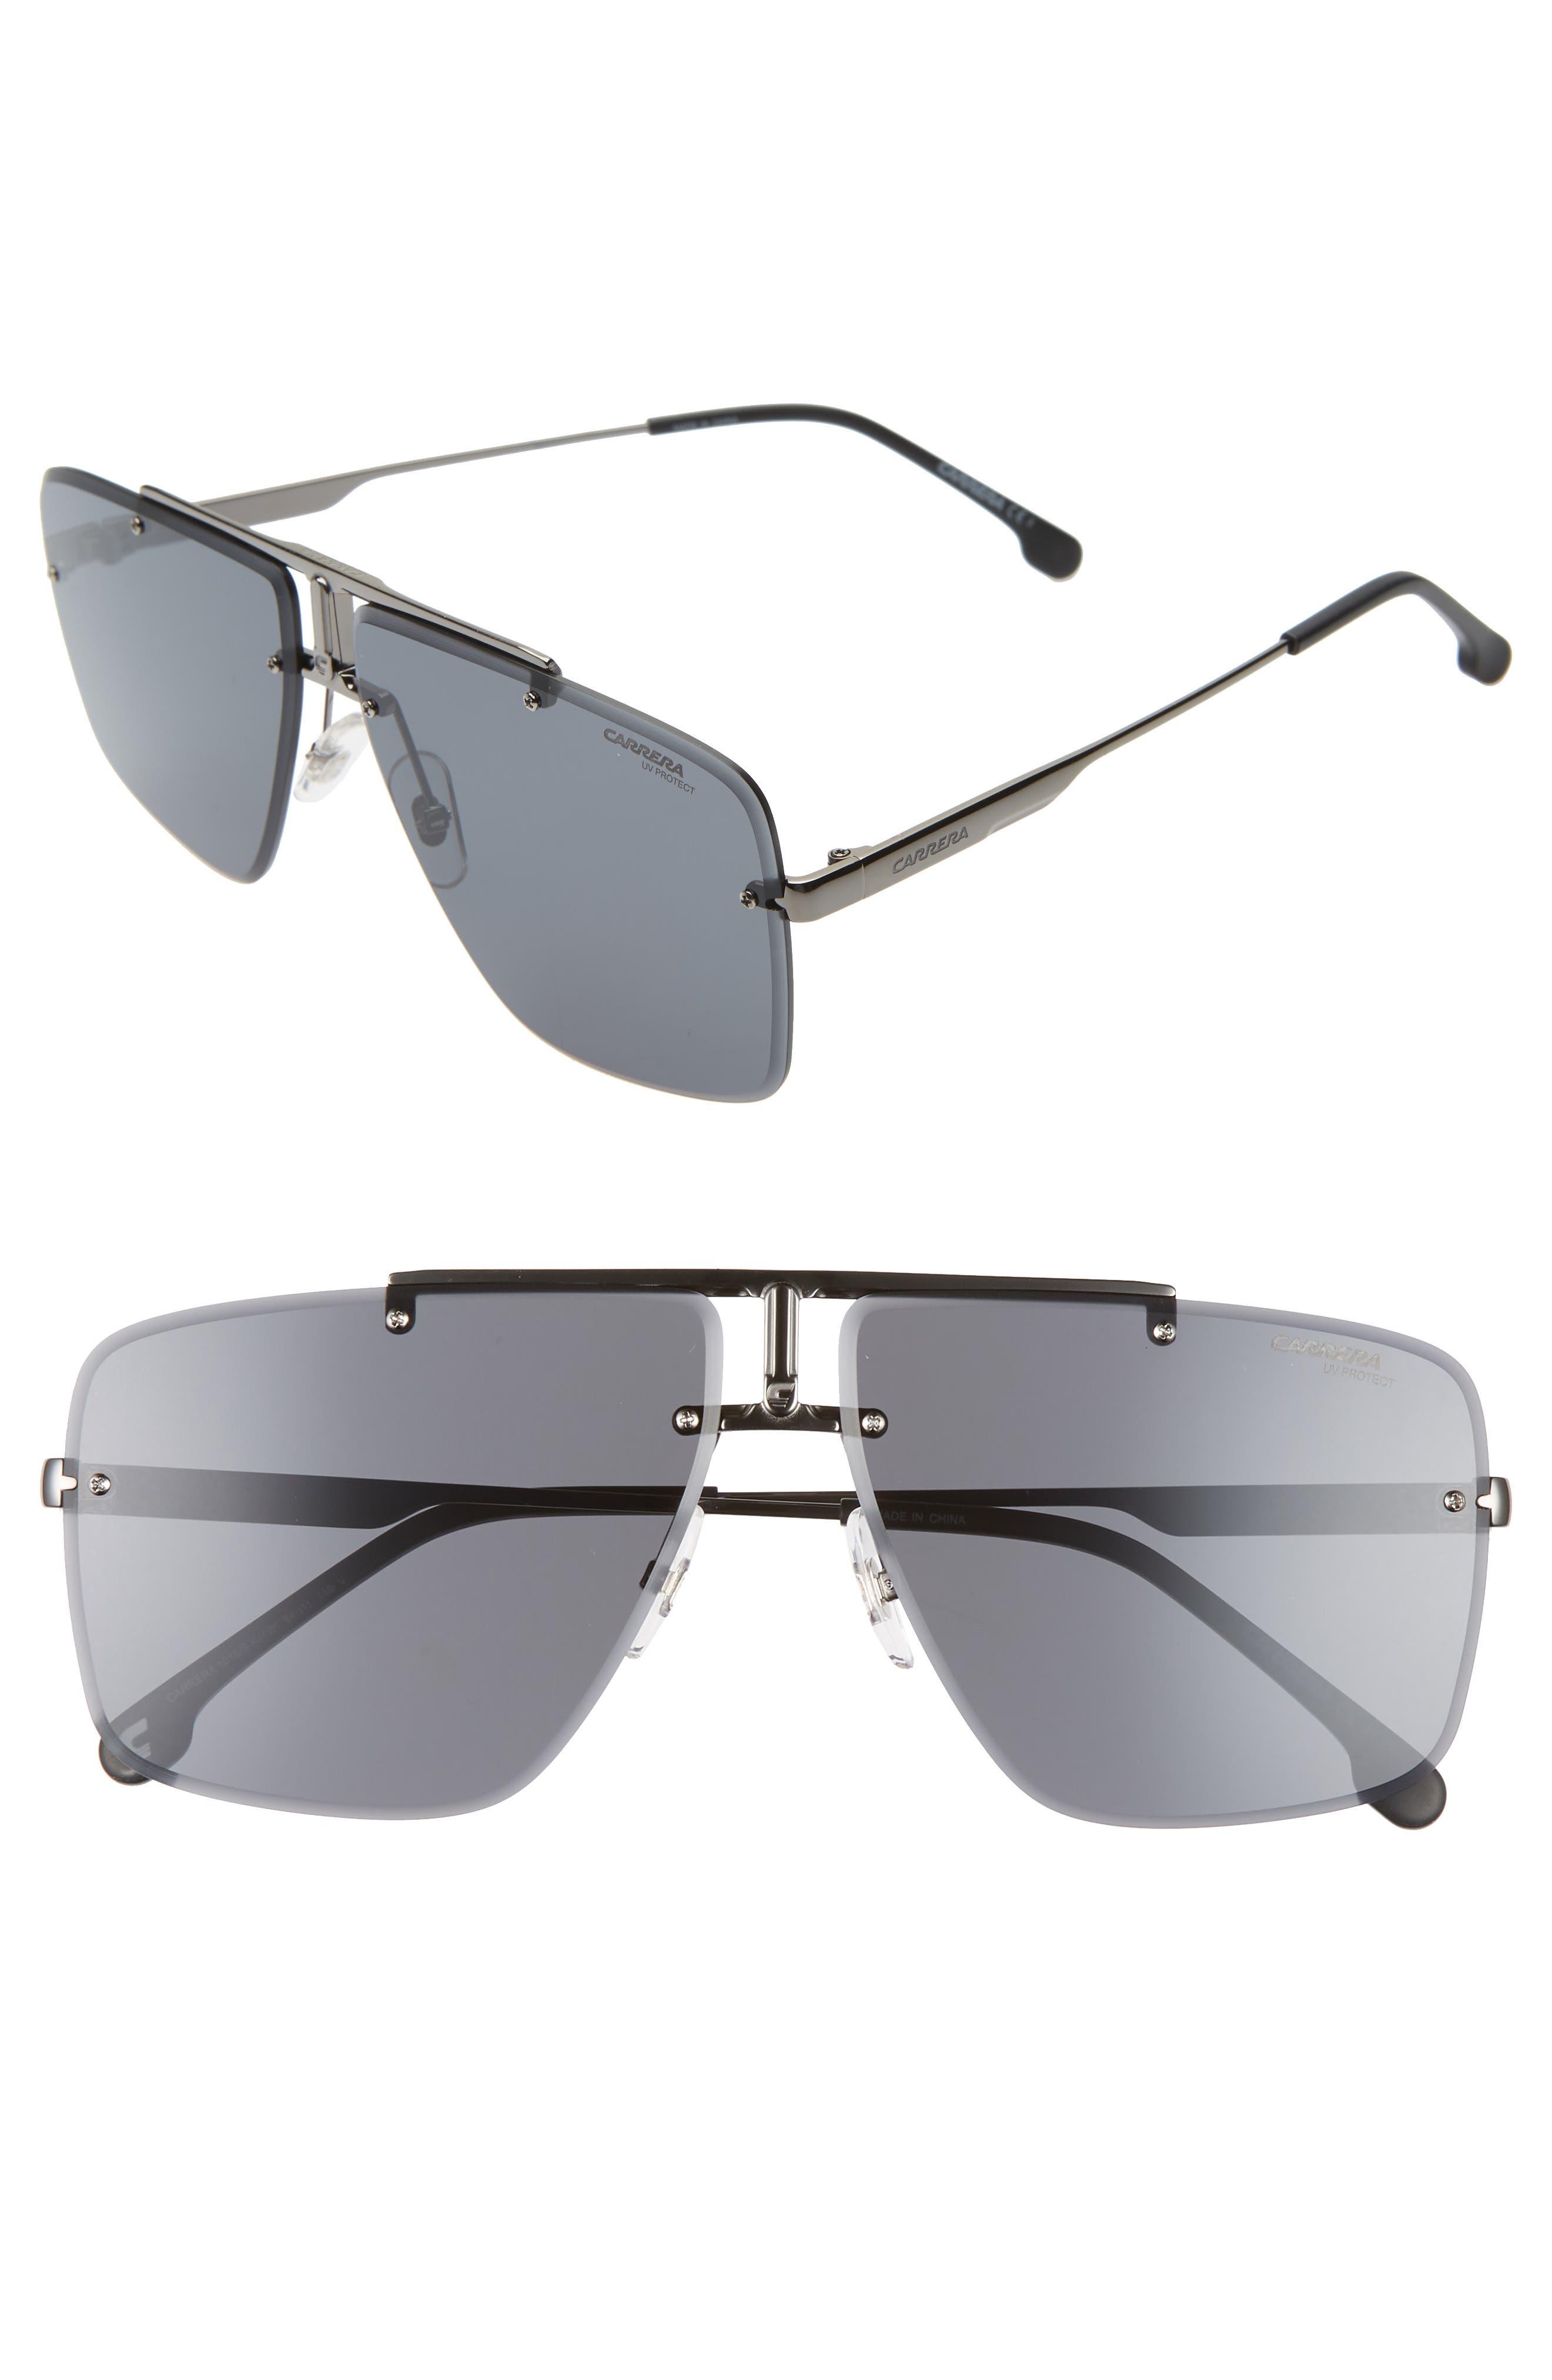 Carrera Eyewear Navigator Sunglasses - Dark Ruthenium